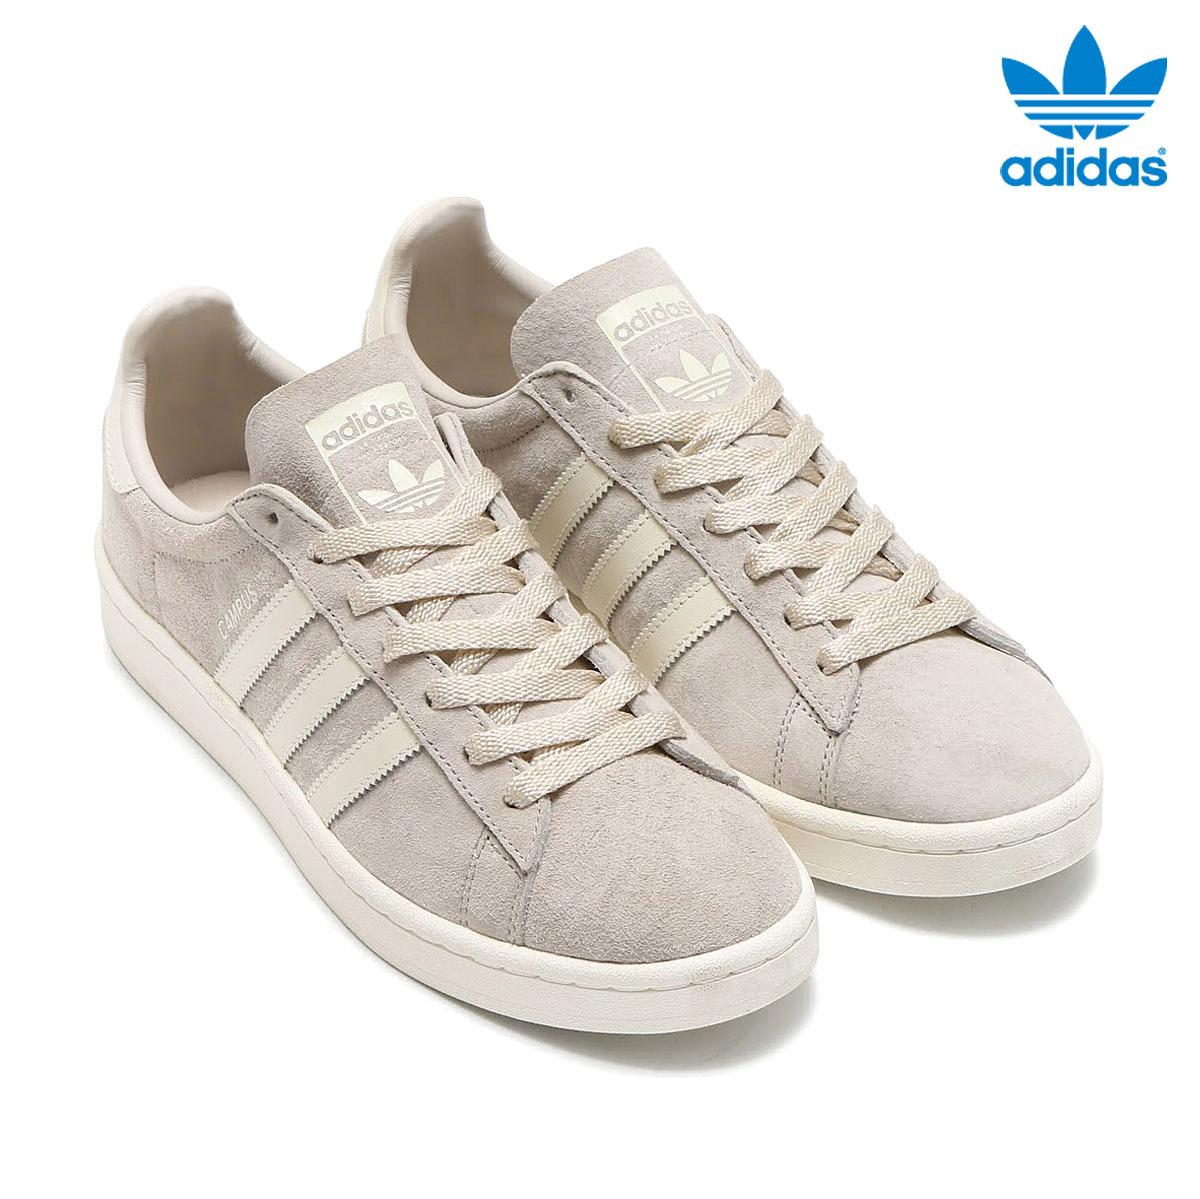 adidas Originals CAMPUS(アディダス オリジナルス CP)(Clear Brown/Off White/Chalk White) 【メンズ レディース スニーカー】17SS-I